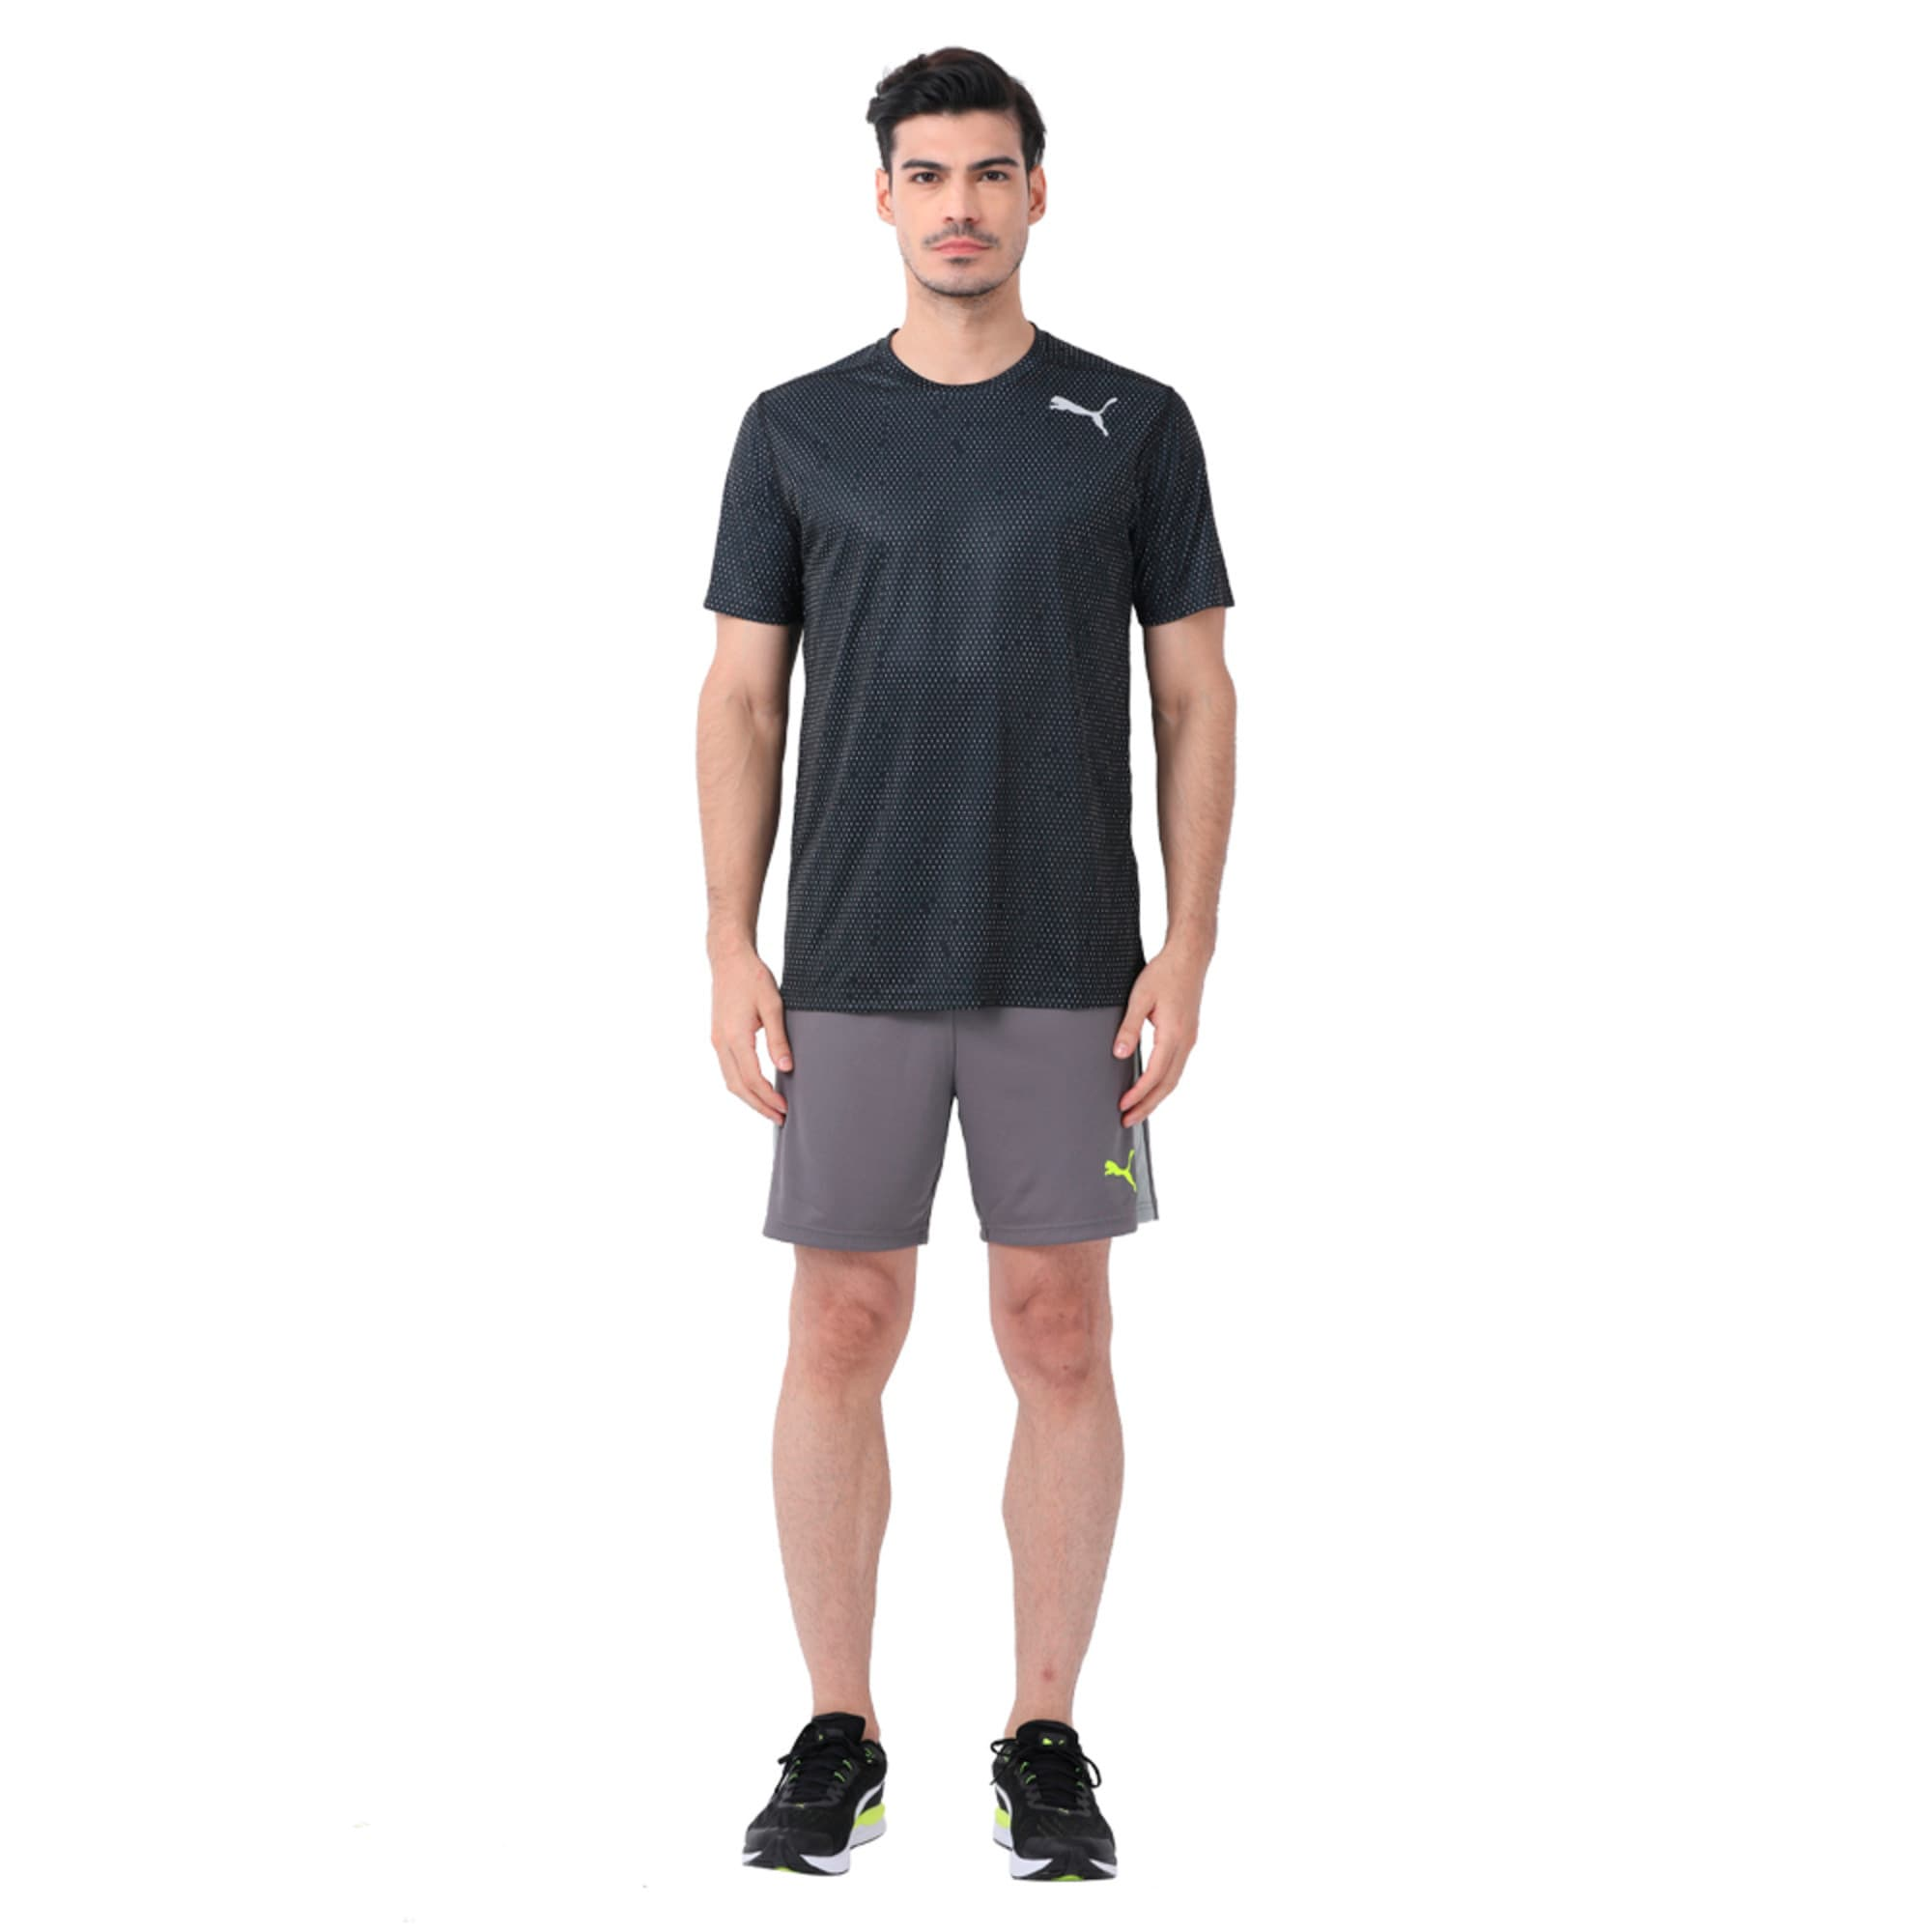 Thumbnail 3 of Training Men's Tech Graphic T-Shirt, puma black-Q3, medium-IND